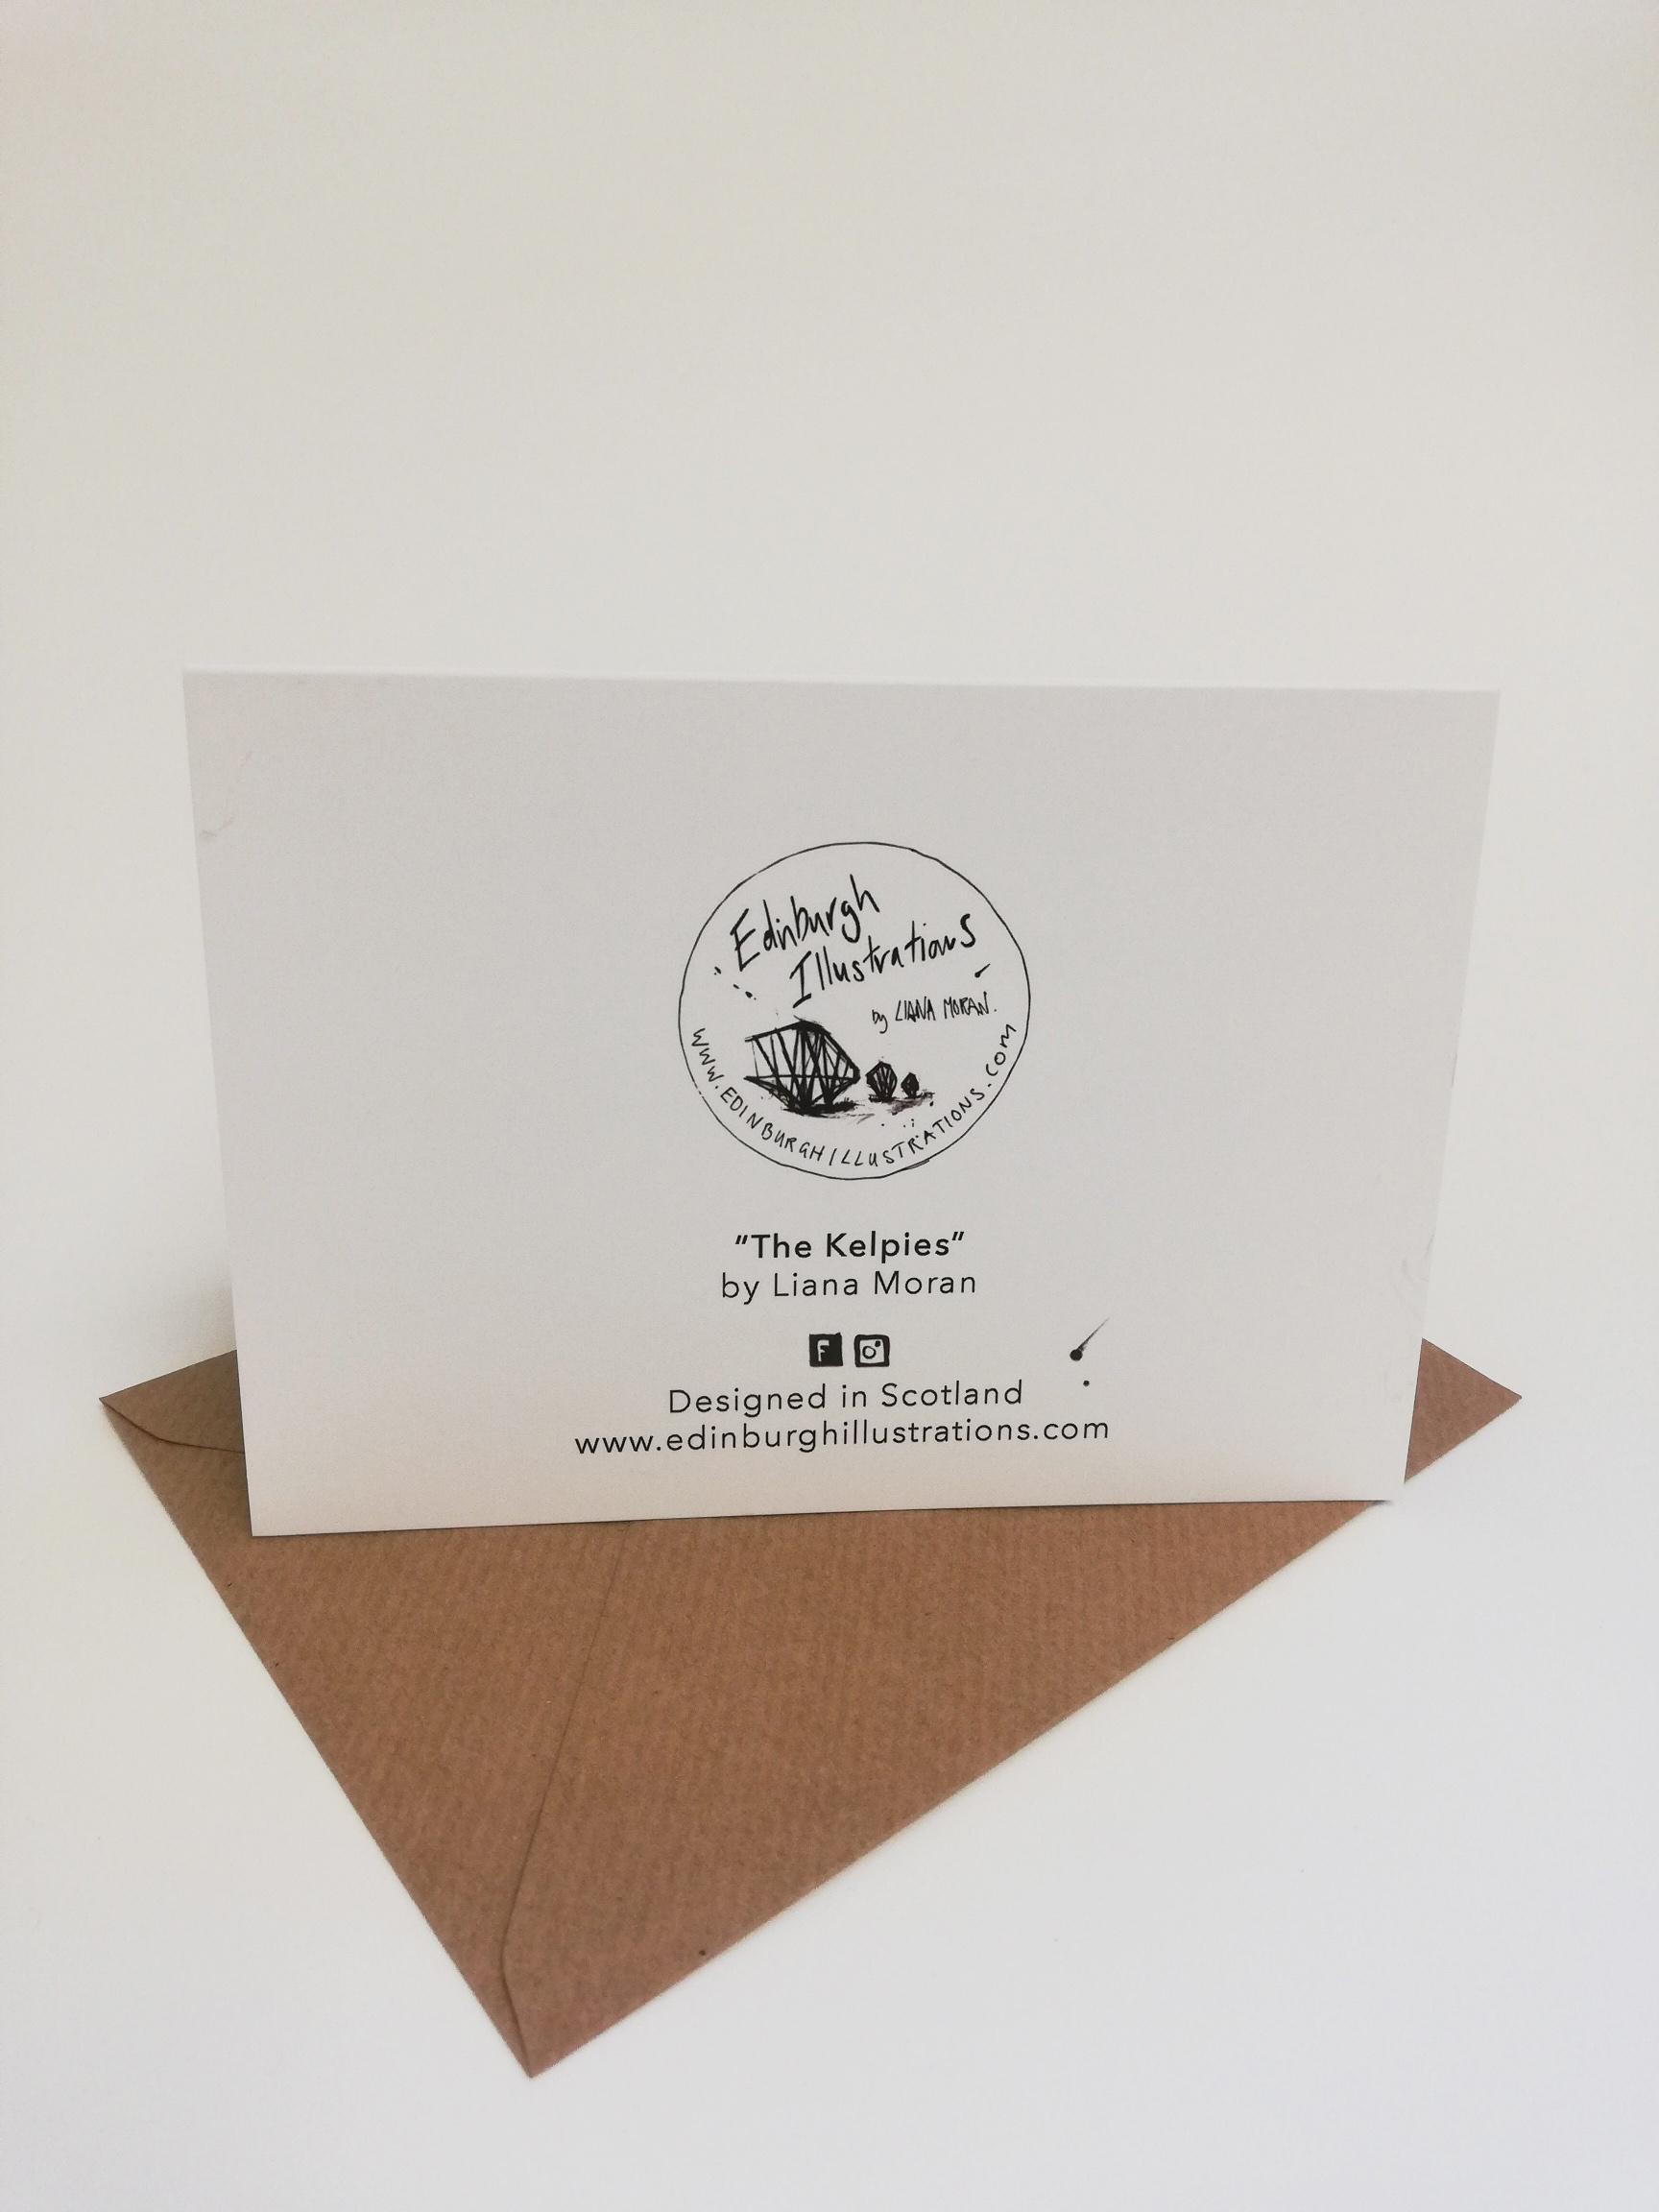 The Kelpies card